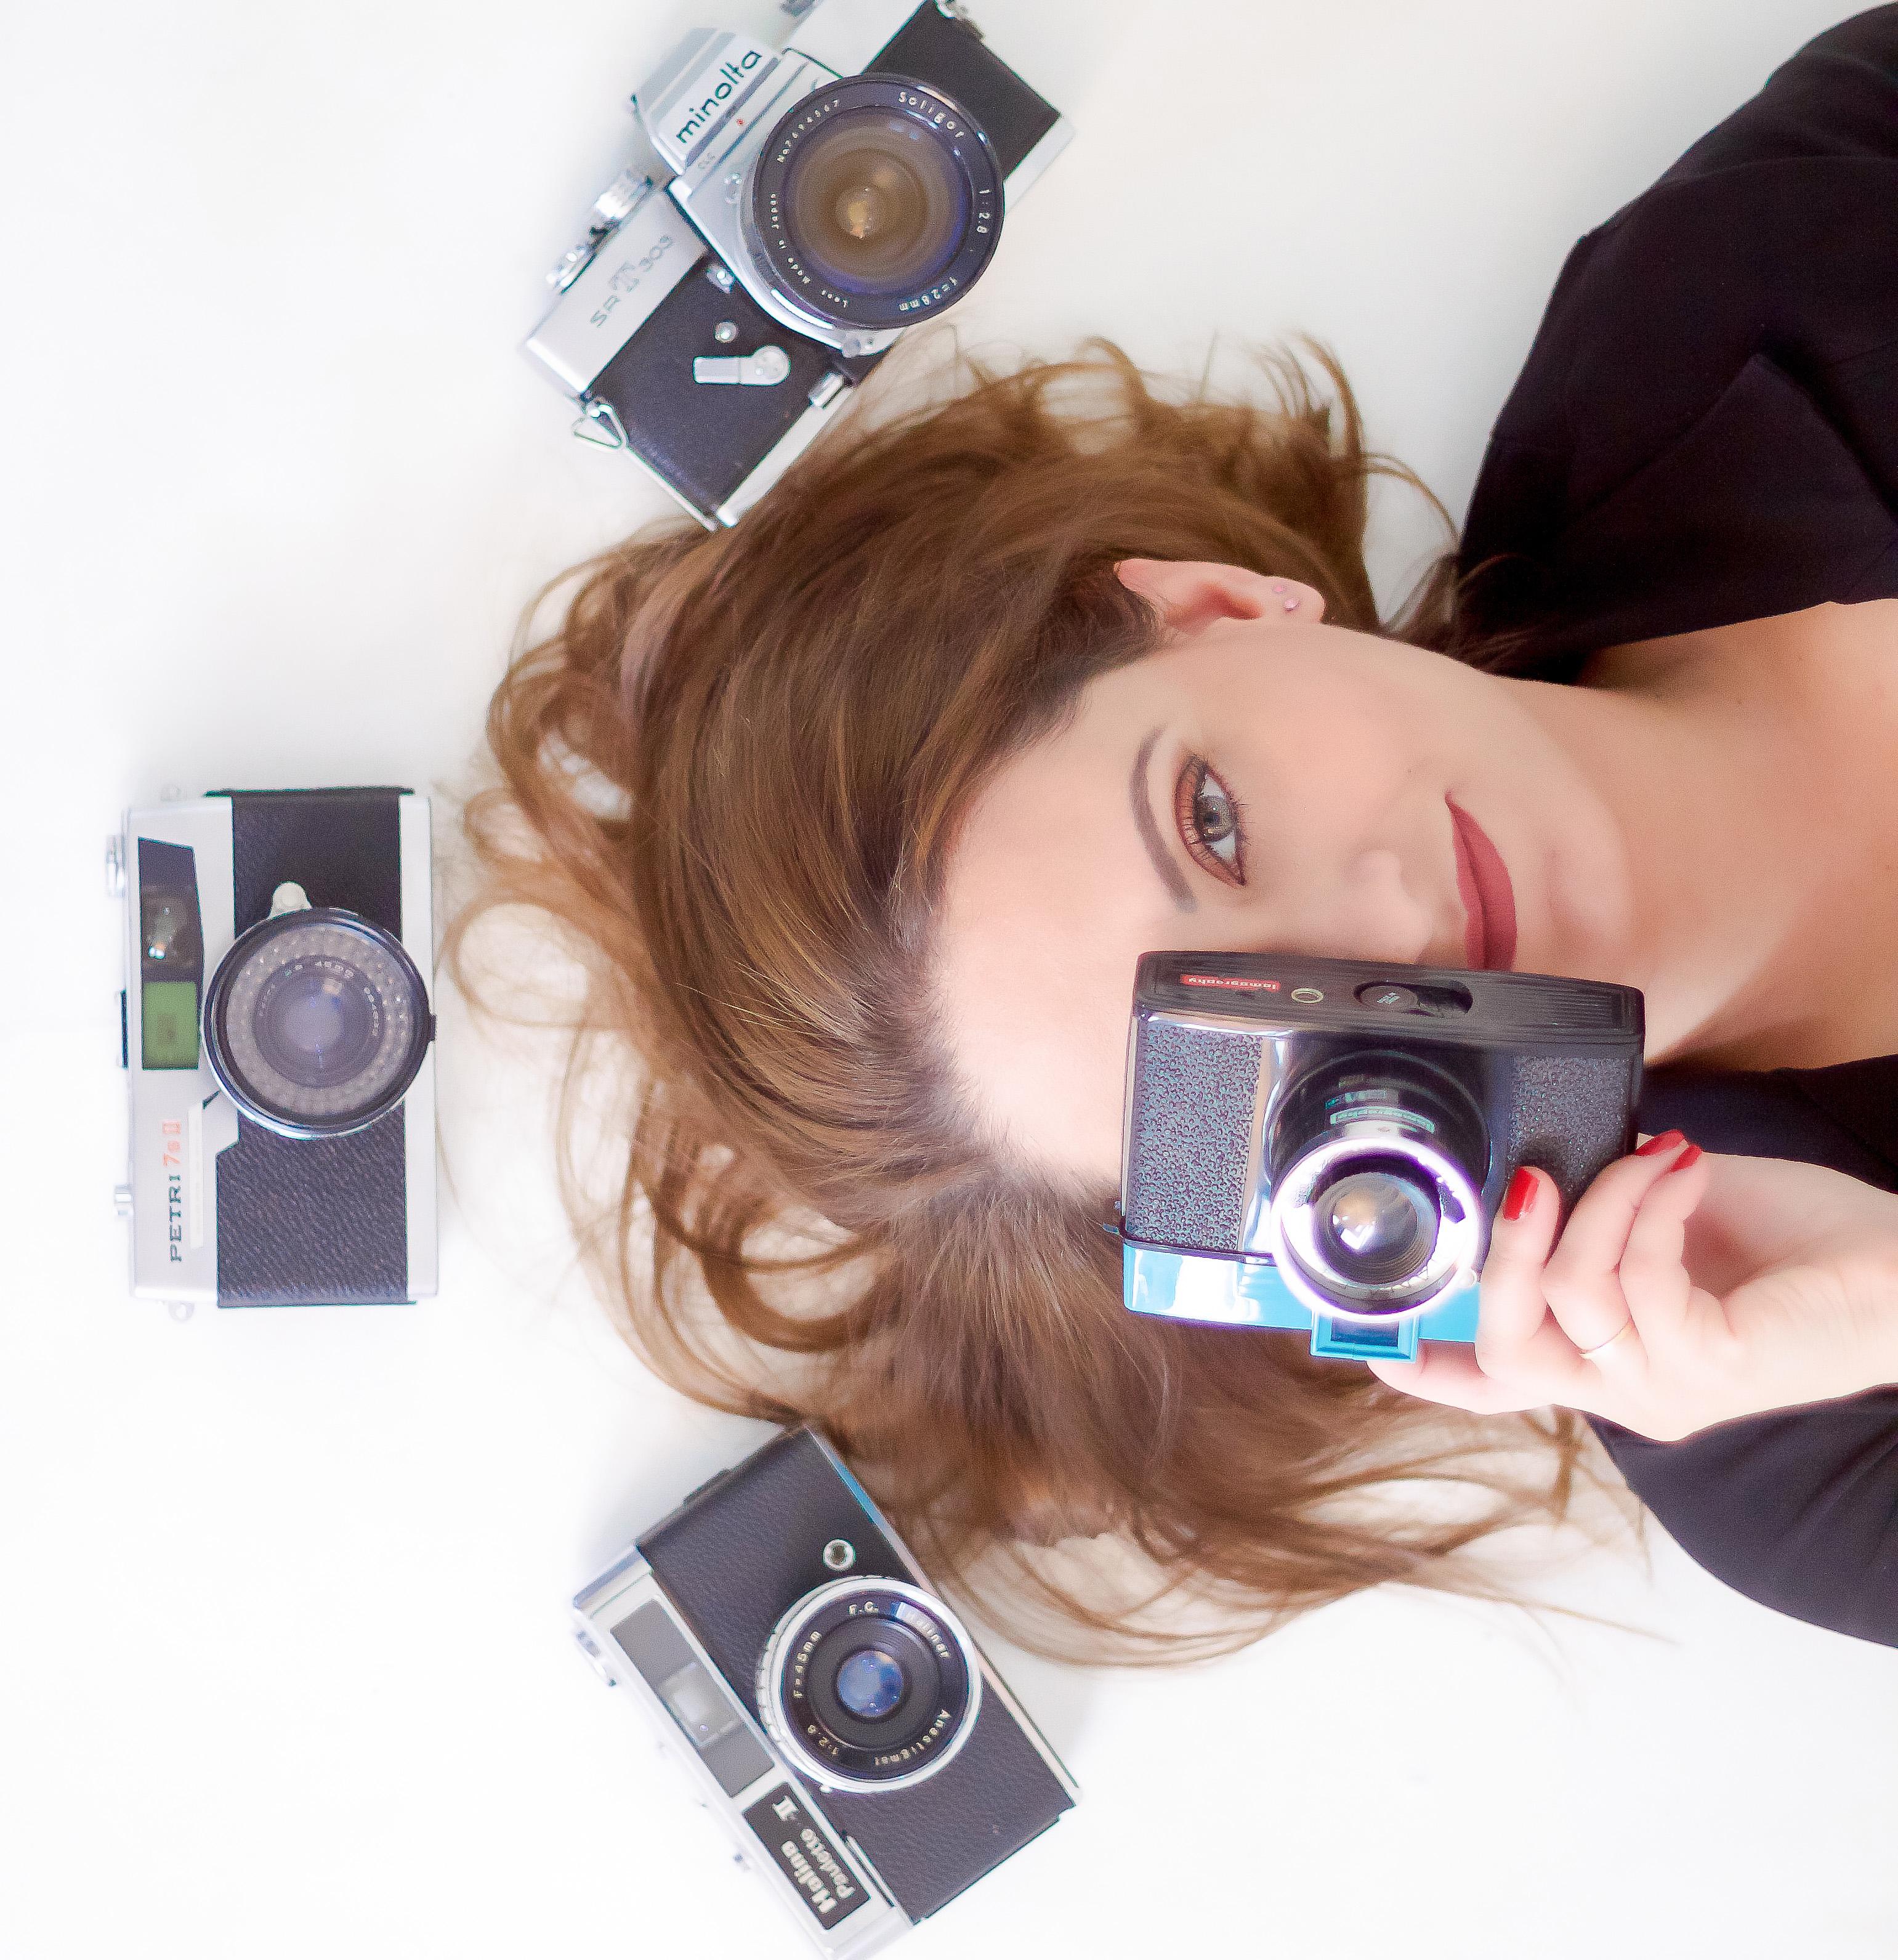 Sobre Fotografia Criativa